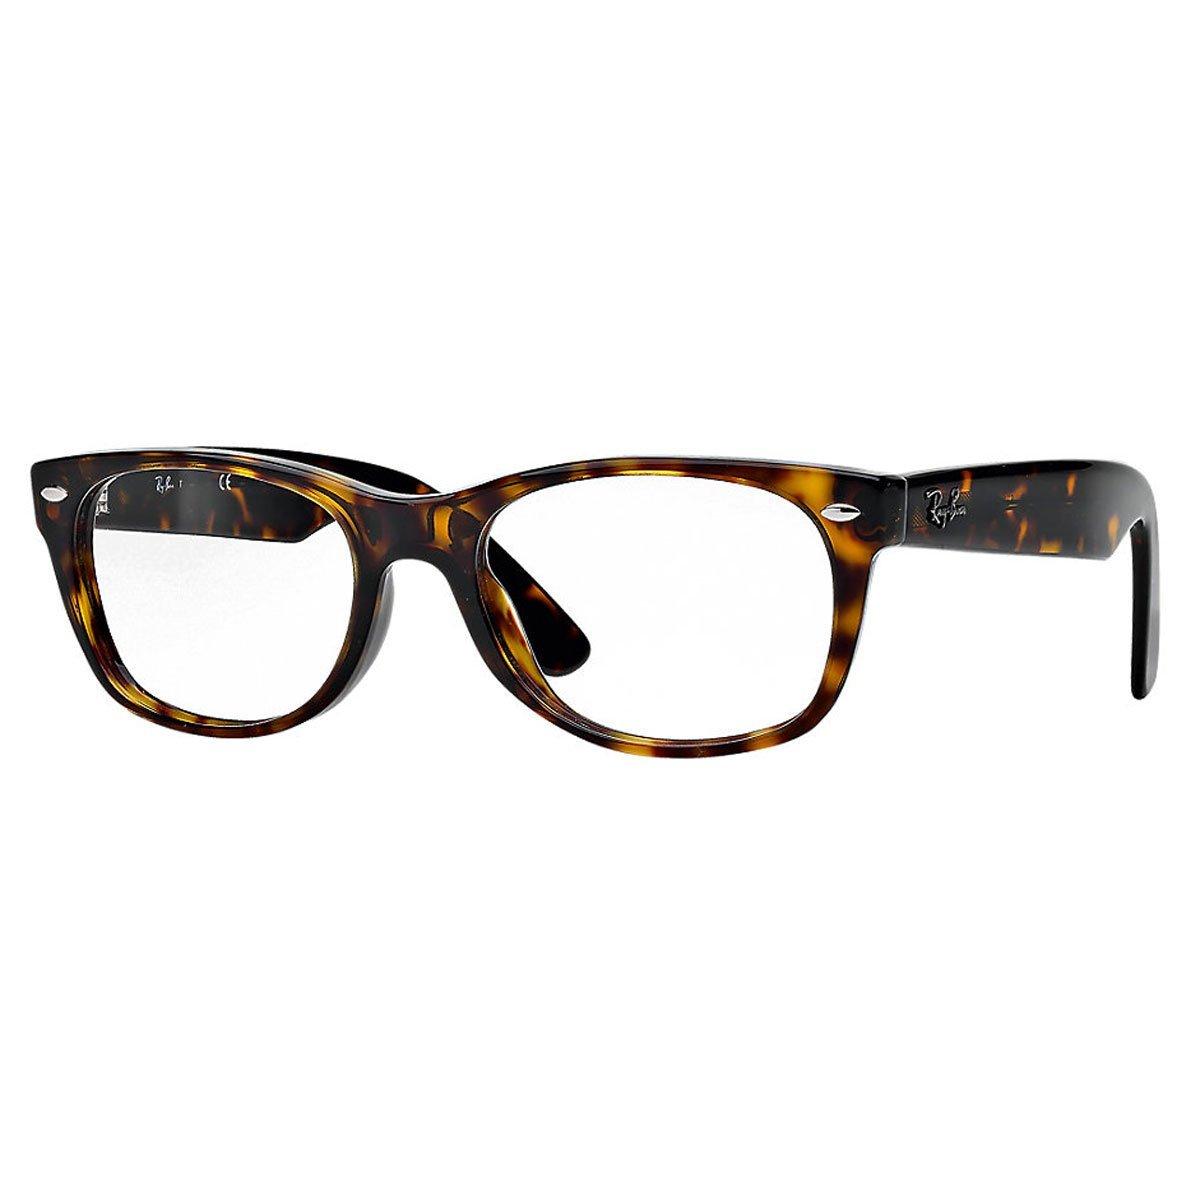 Ray-Ban New Wayfarer Square Eyeglasses,Dark Havana,50 mm by Ray-Ban